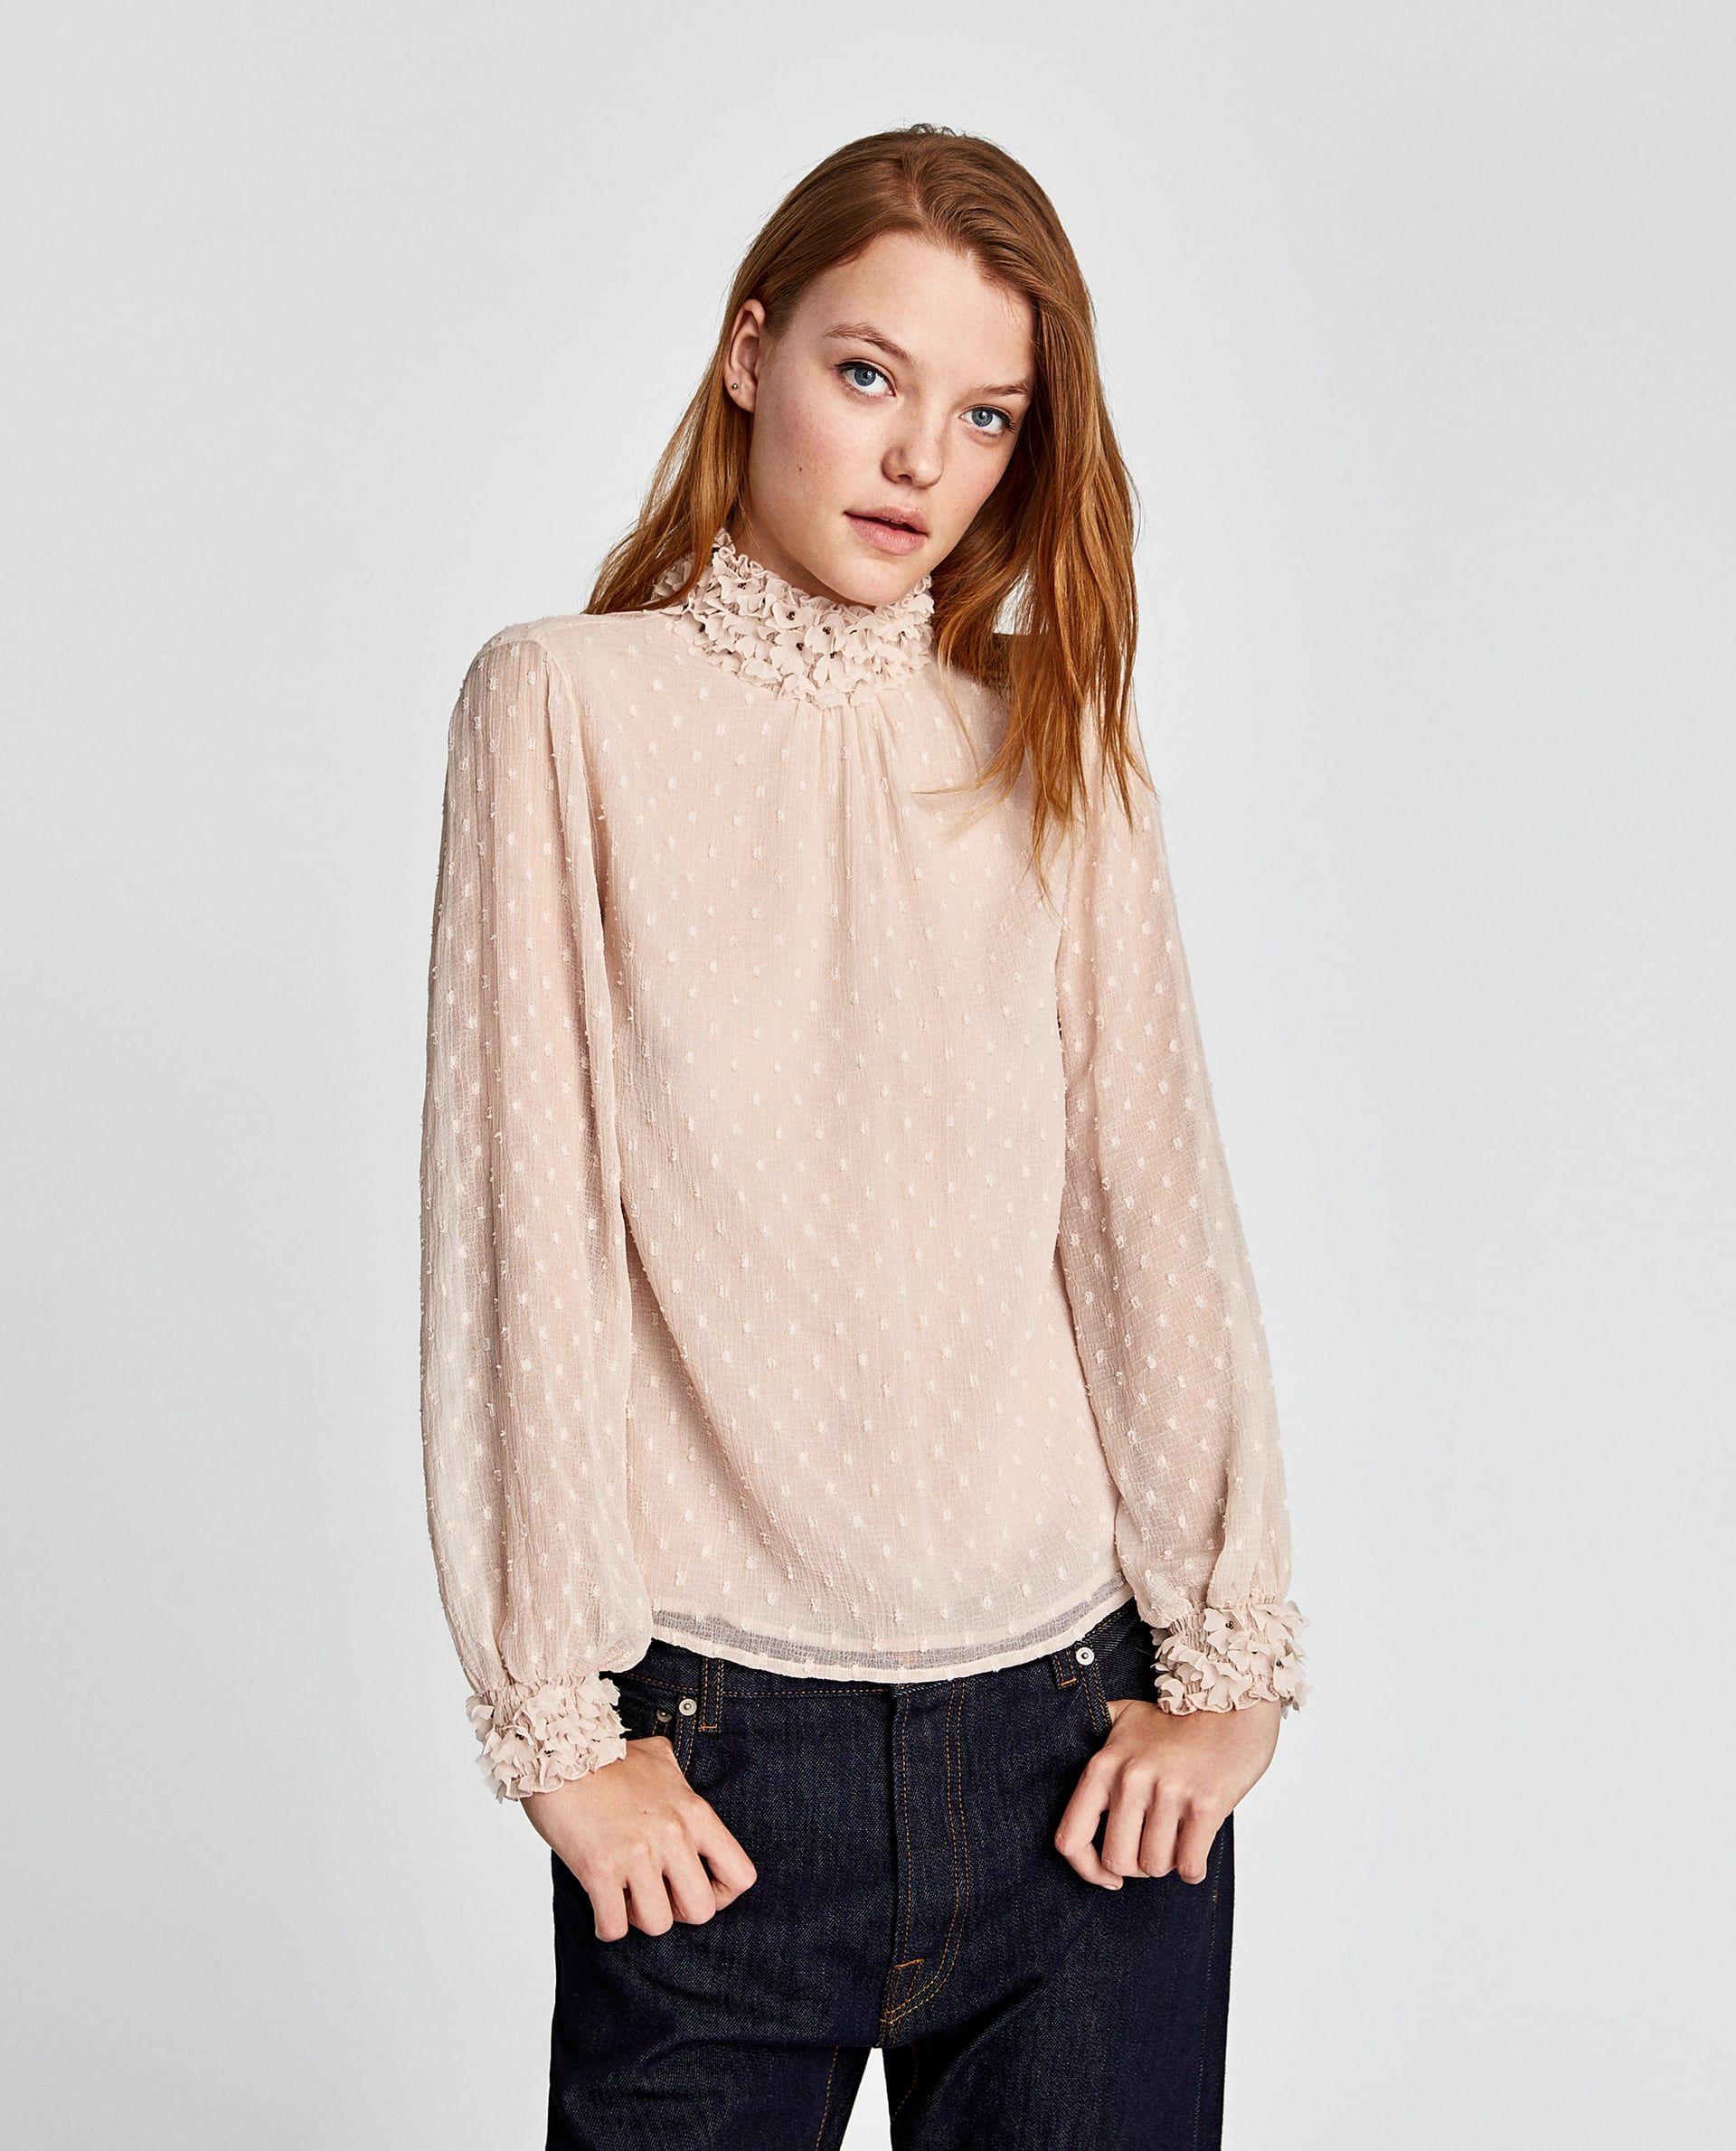 5101ef3748 FLORAL DOTTED MESH TOP | w a r d r o b e | Fashion, Tops, Shirt blouses